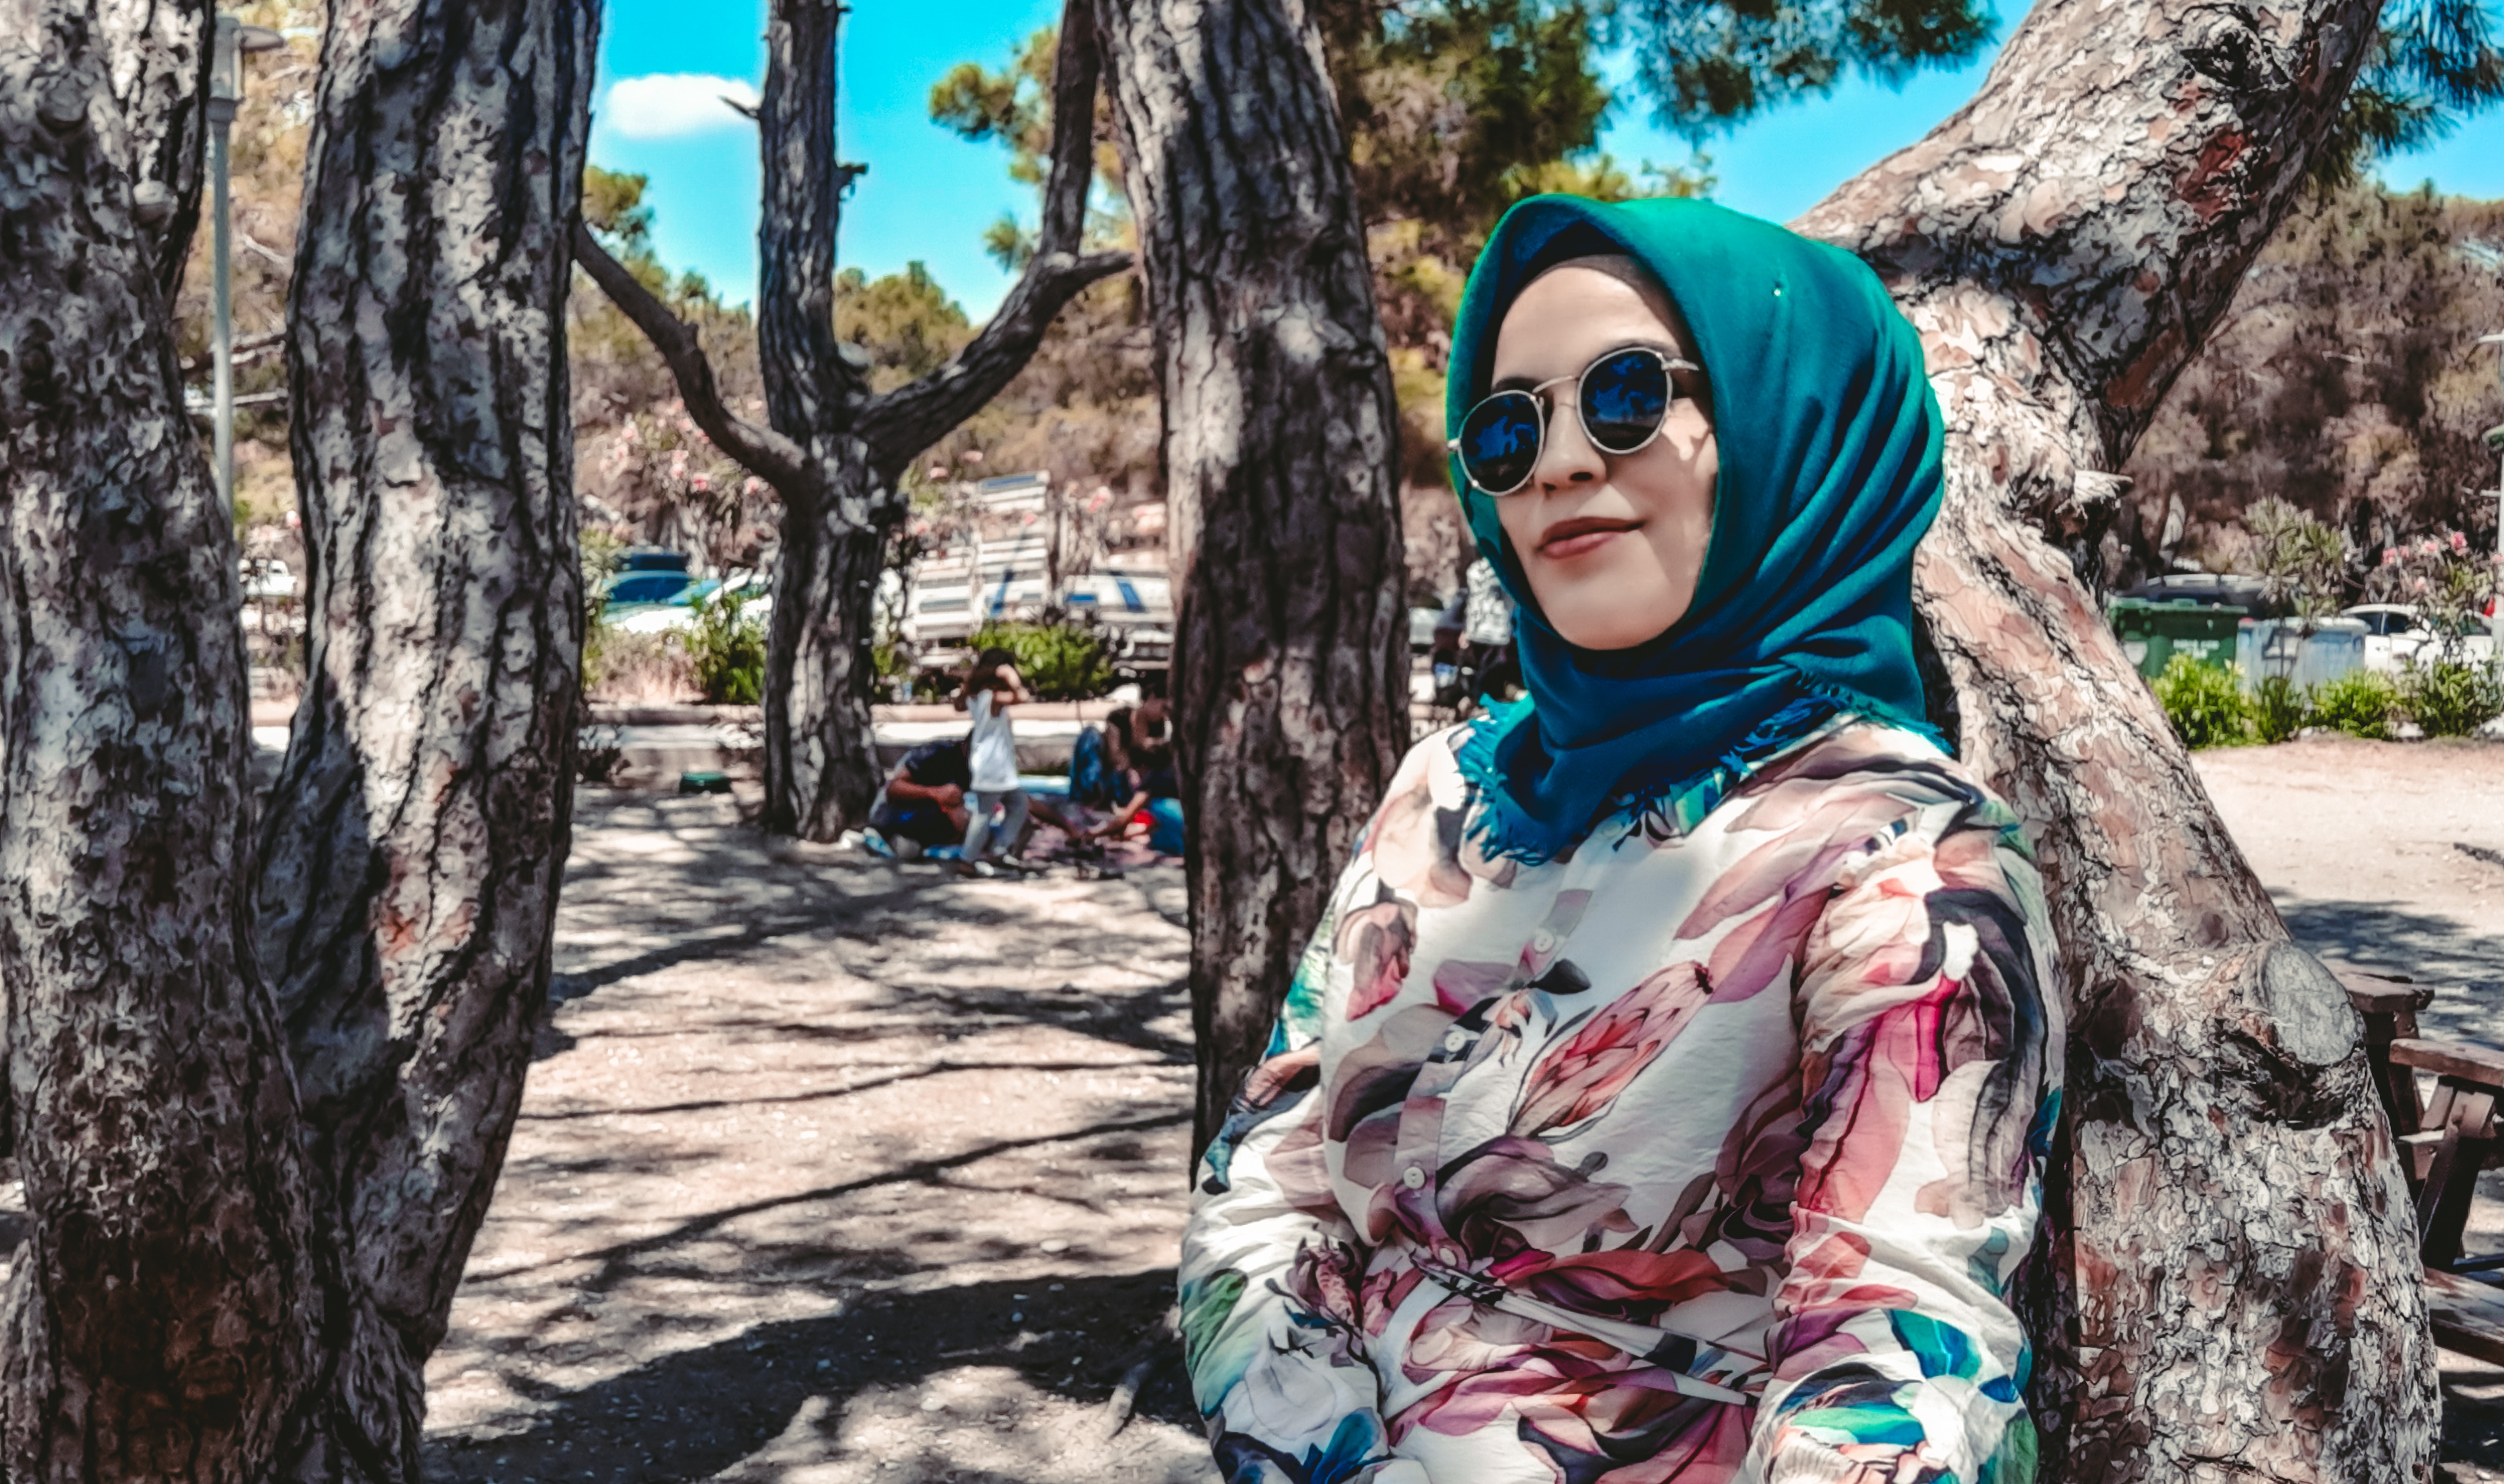 Fatma Tuğba Arslan